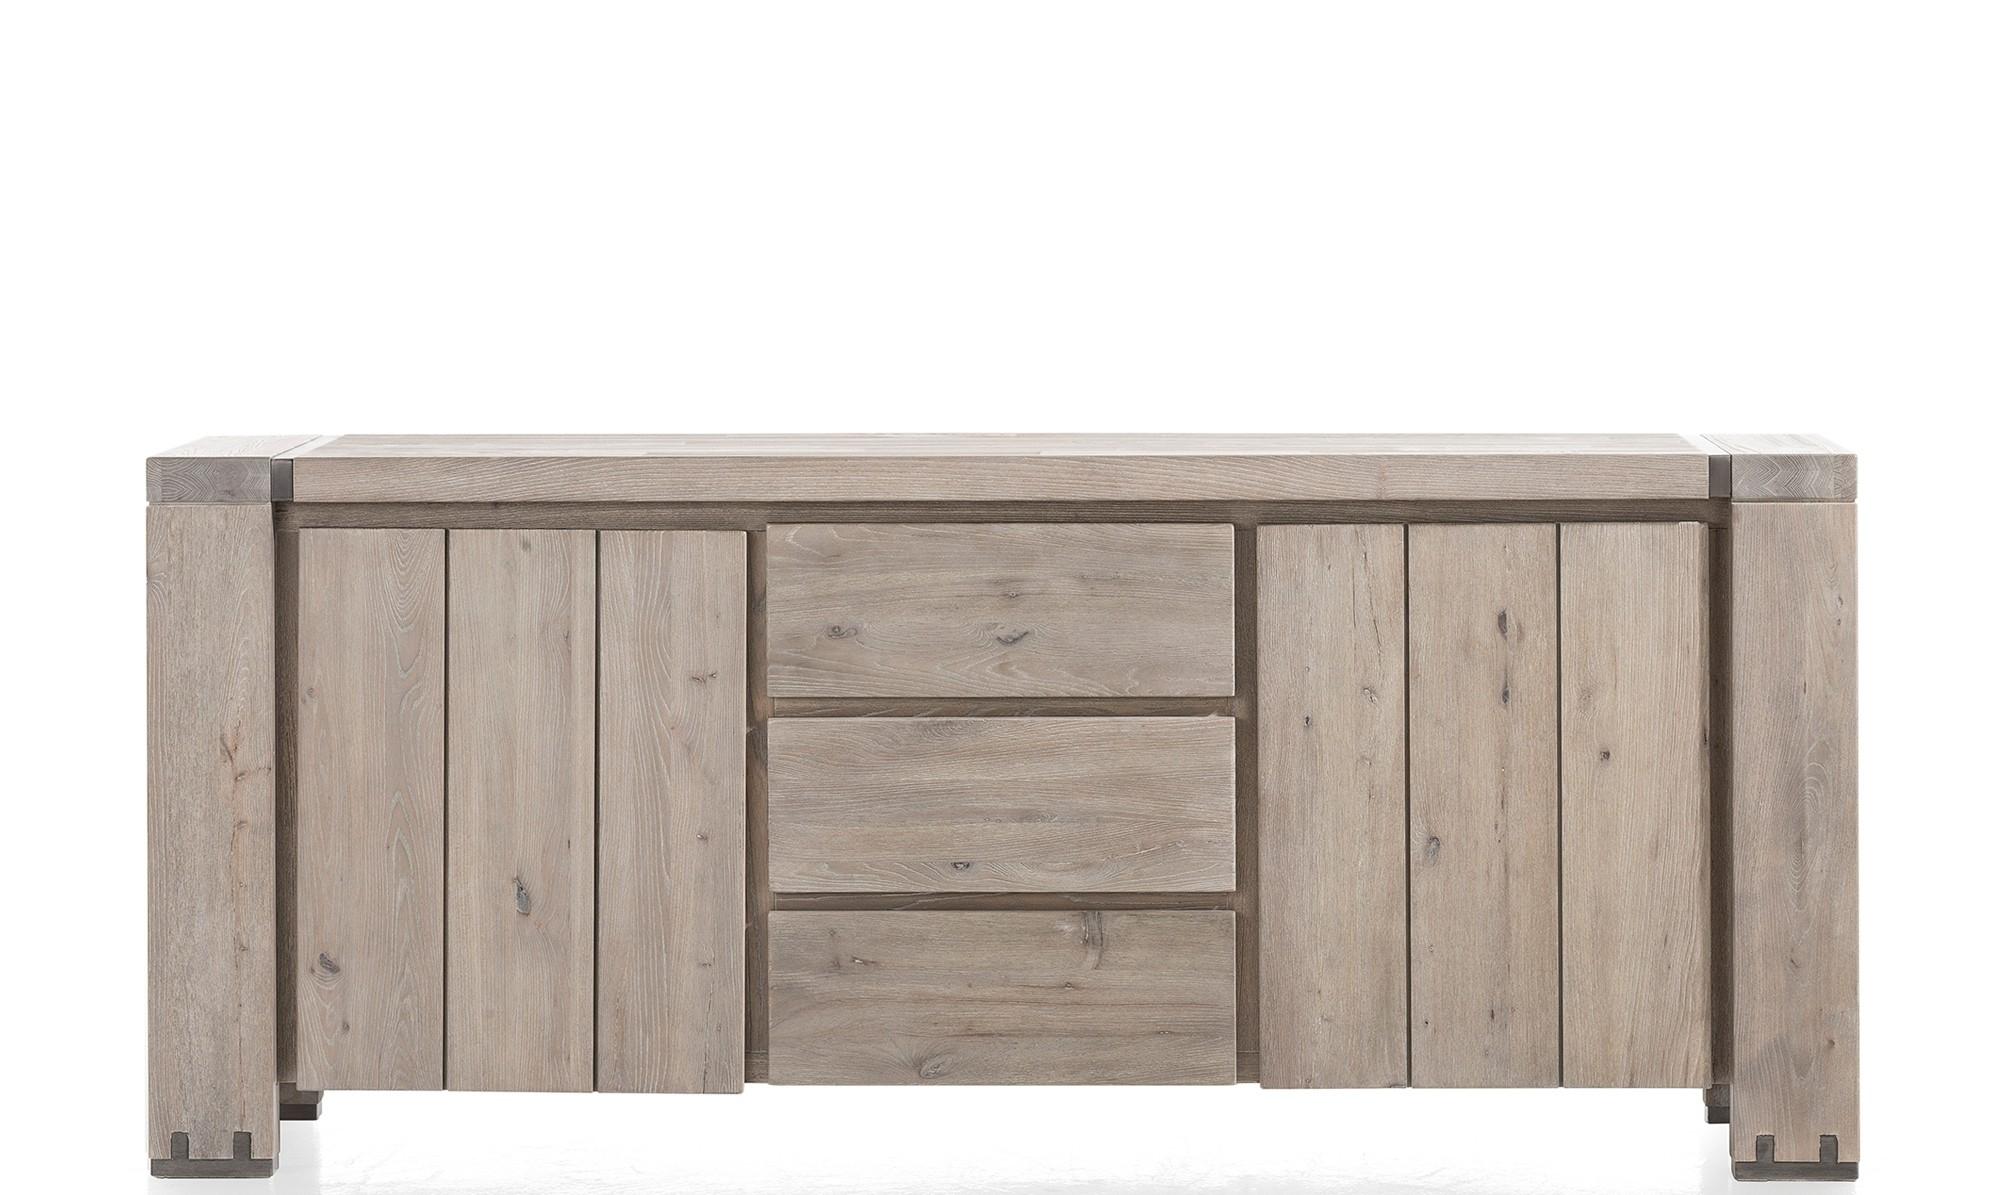 Sideboards – Modern, Oak & Pine Sideboards – Fishpools With Regard To 2018 Square Brass 4 Door Sideboards (#17 of 20)